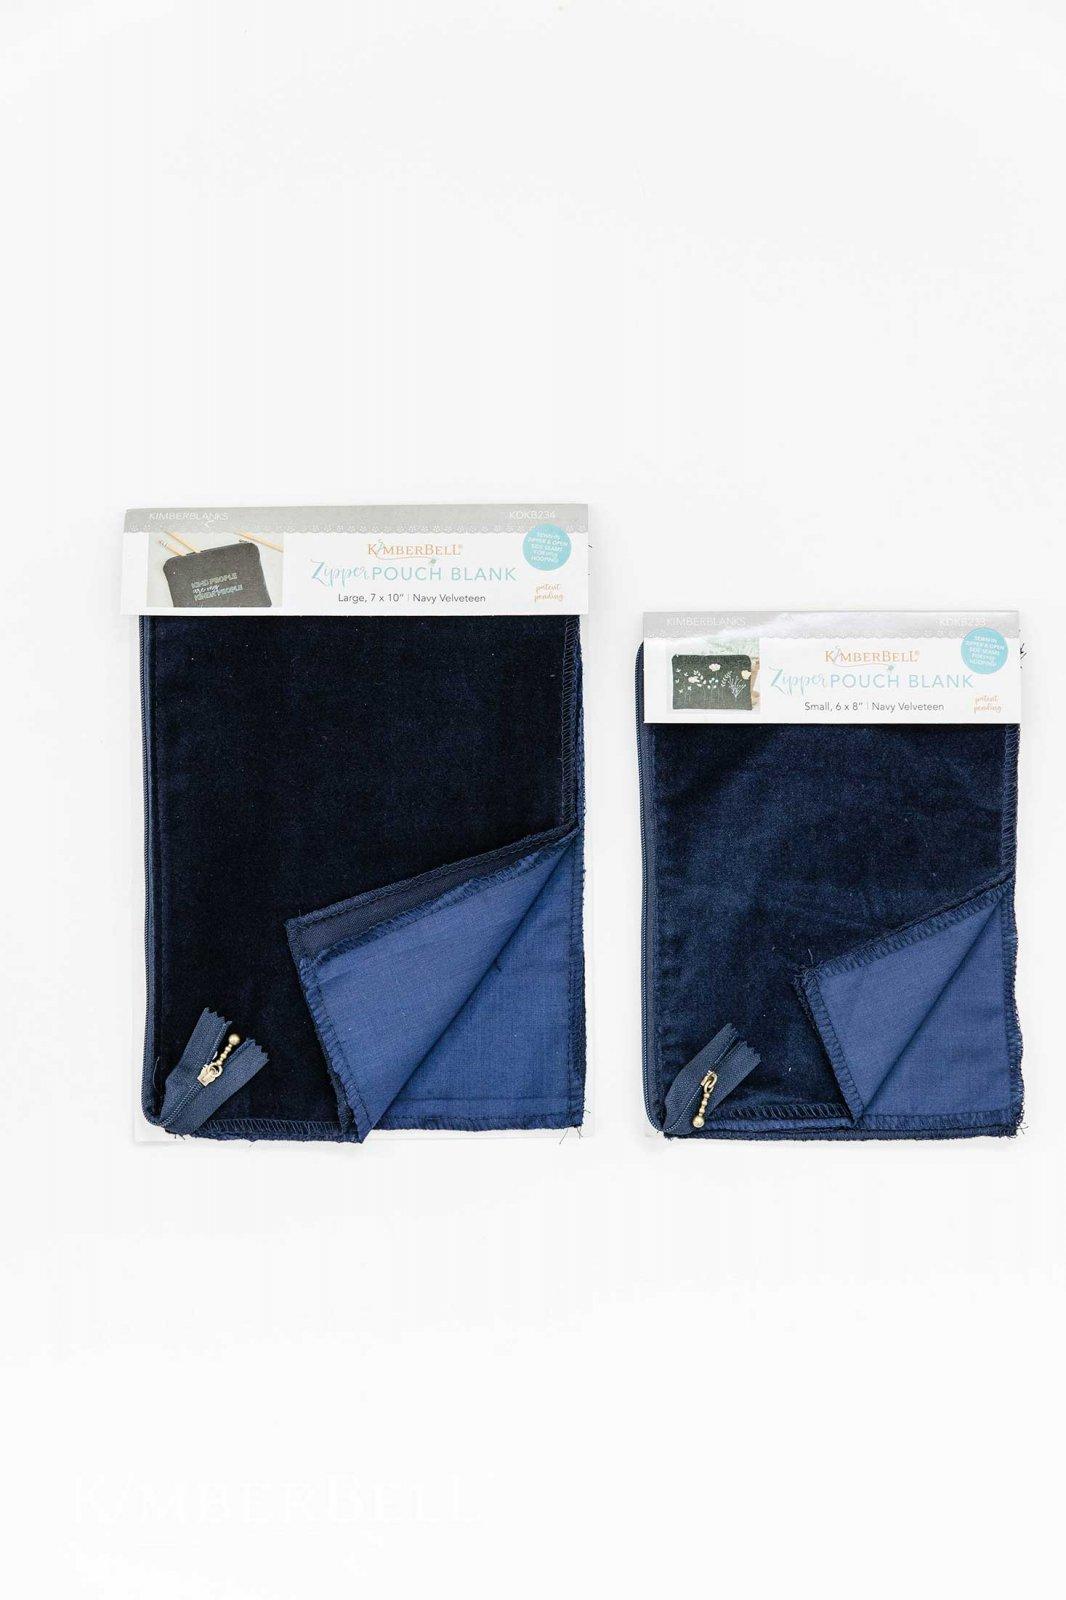 Velveteen Zipper Pouch Blank - Navy